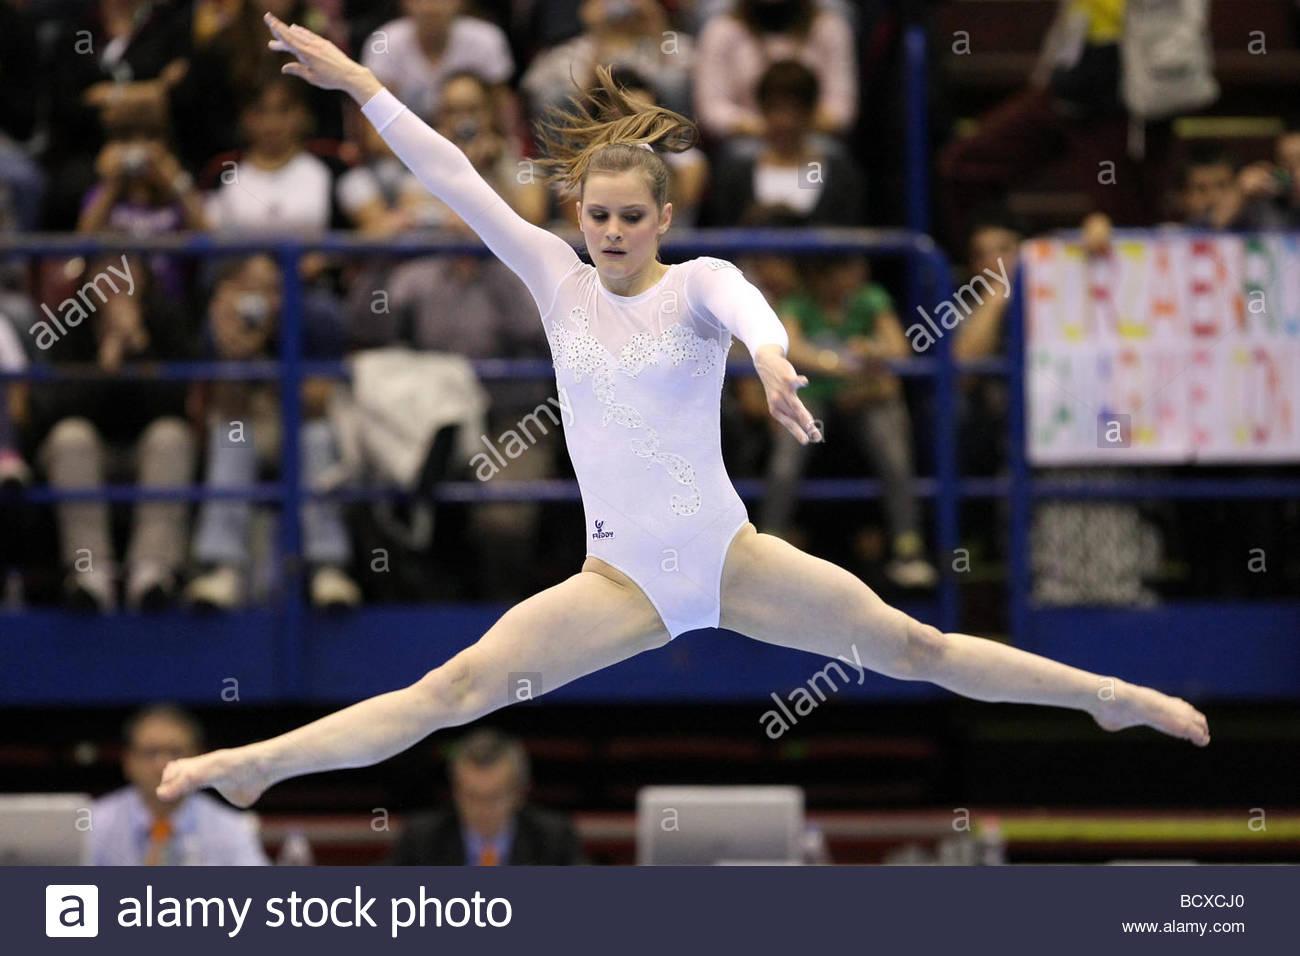 lia parolari, milano 2009, europeanartisticgymnasticchampionships - Stock Image